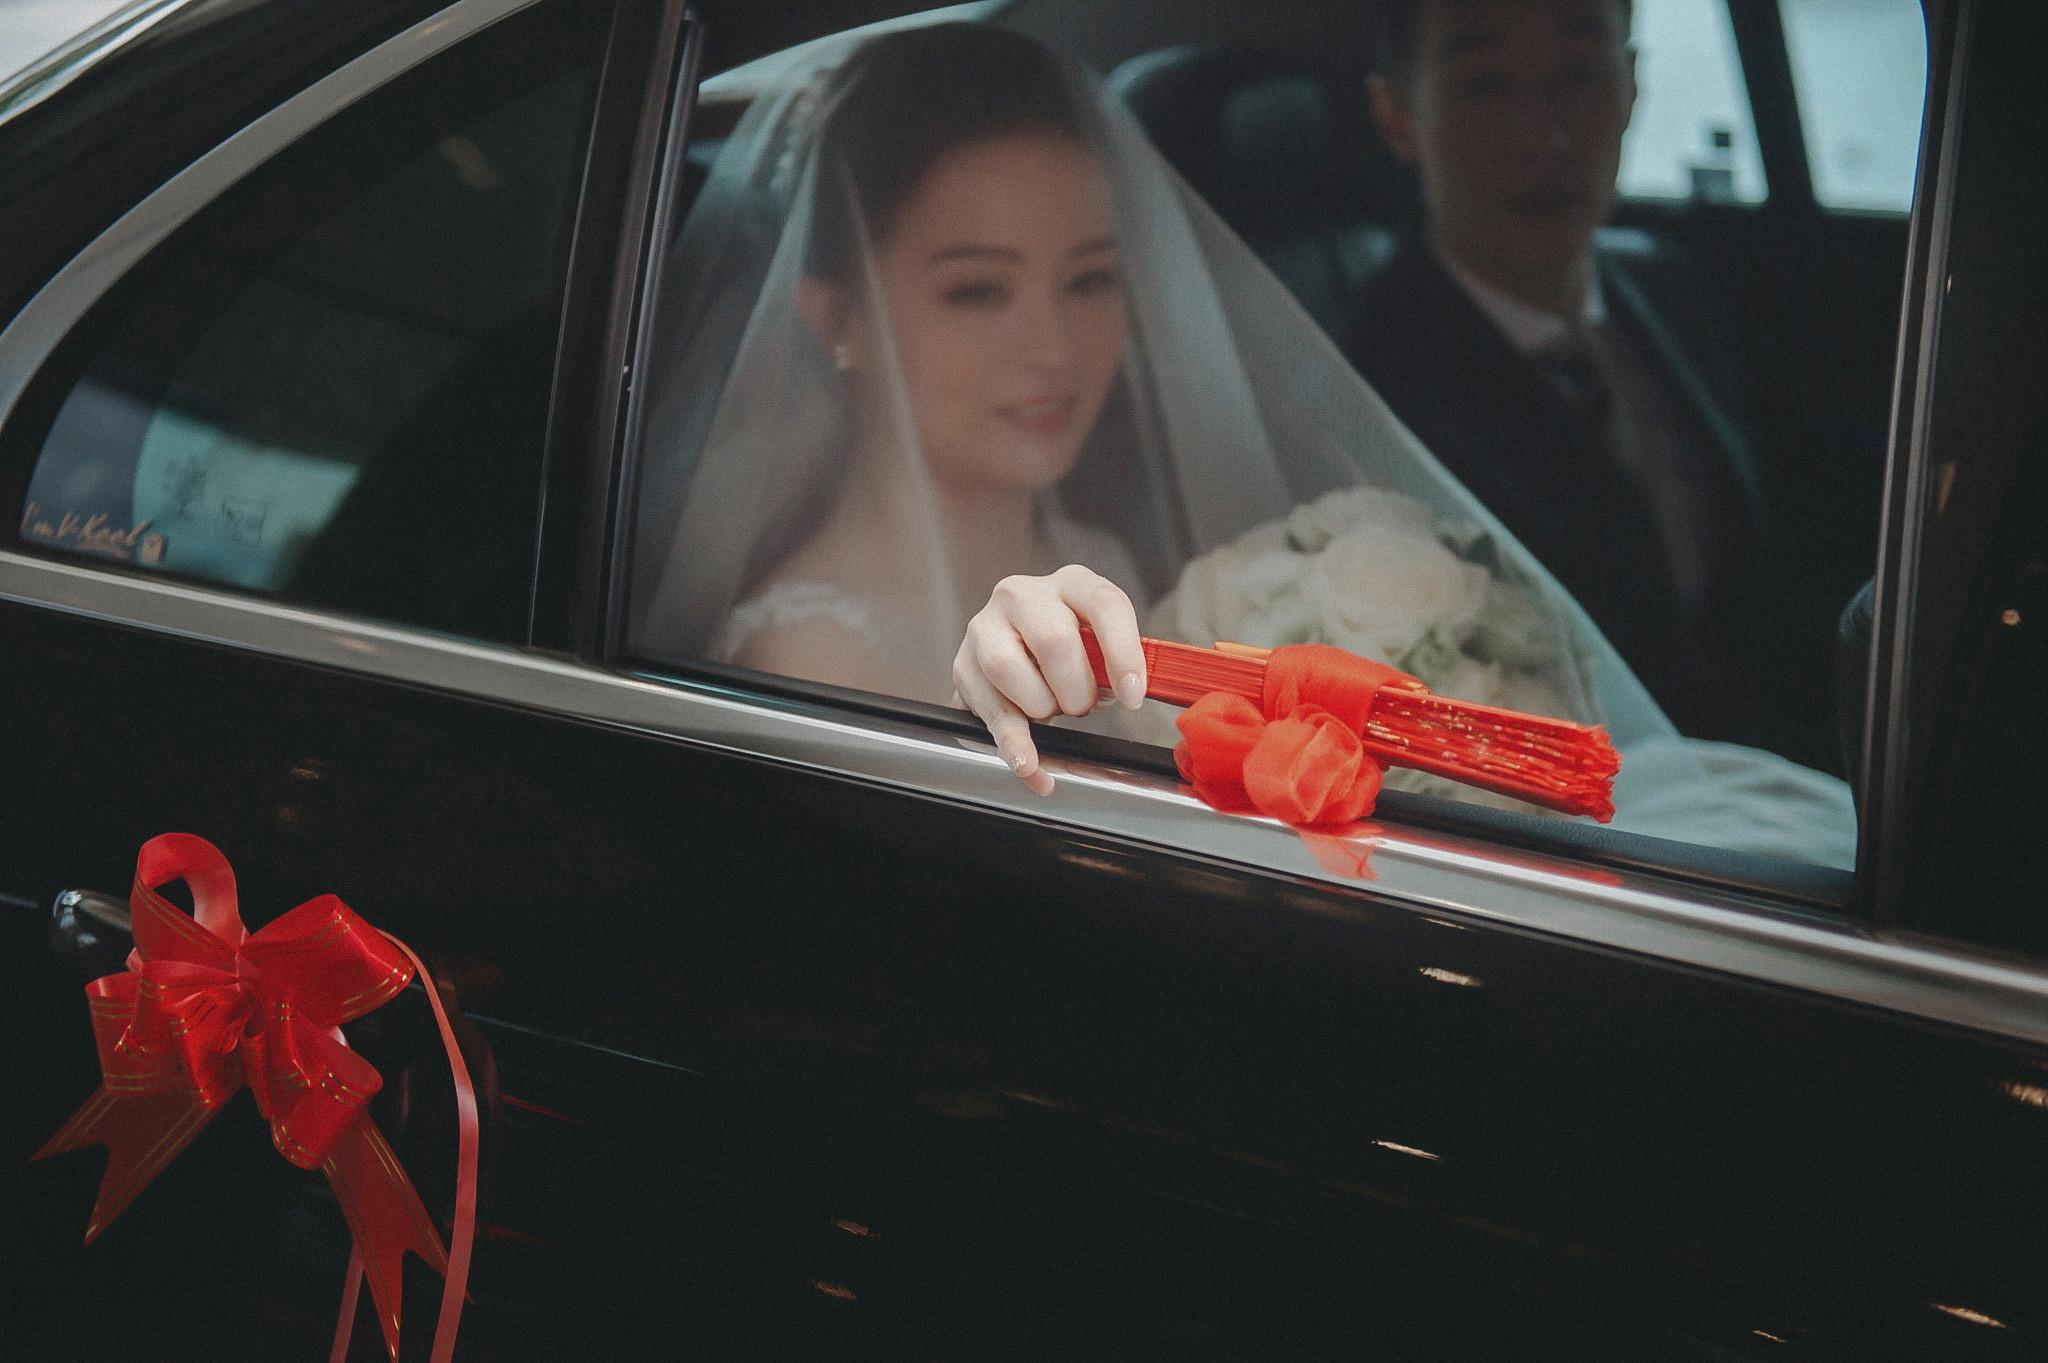 Easternwedding 婚紗攝影 EW JMH 婚禮 婚攝 居米 台北